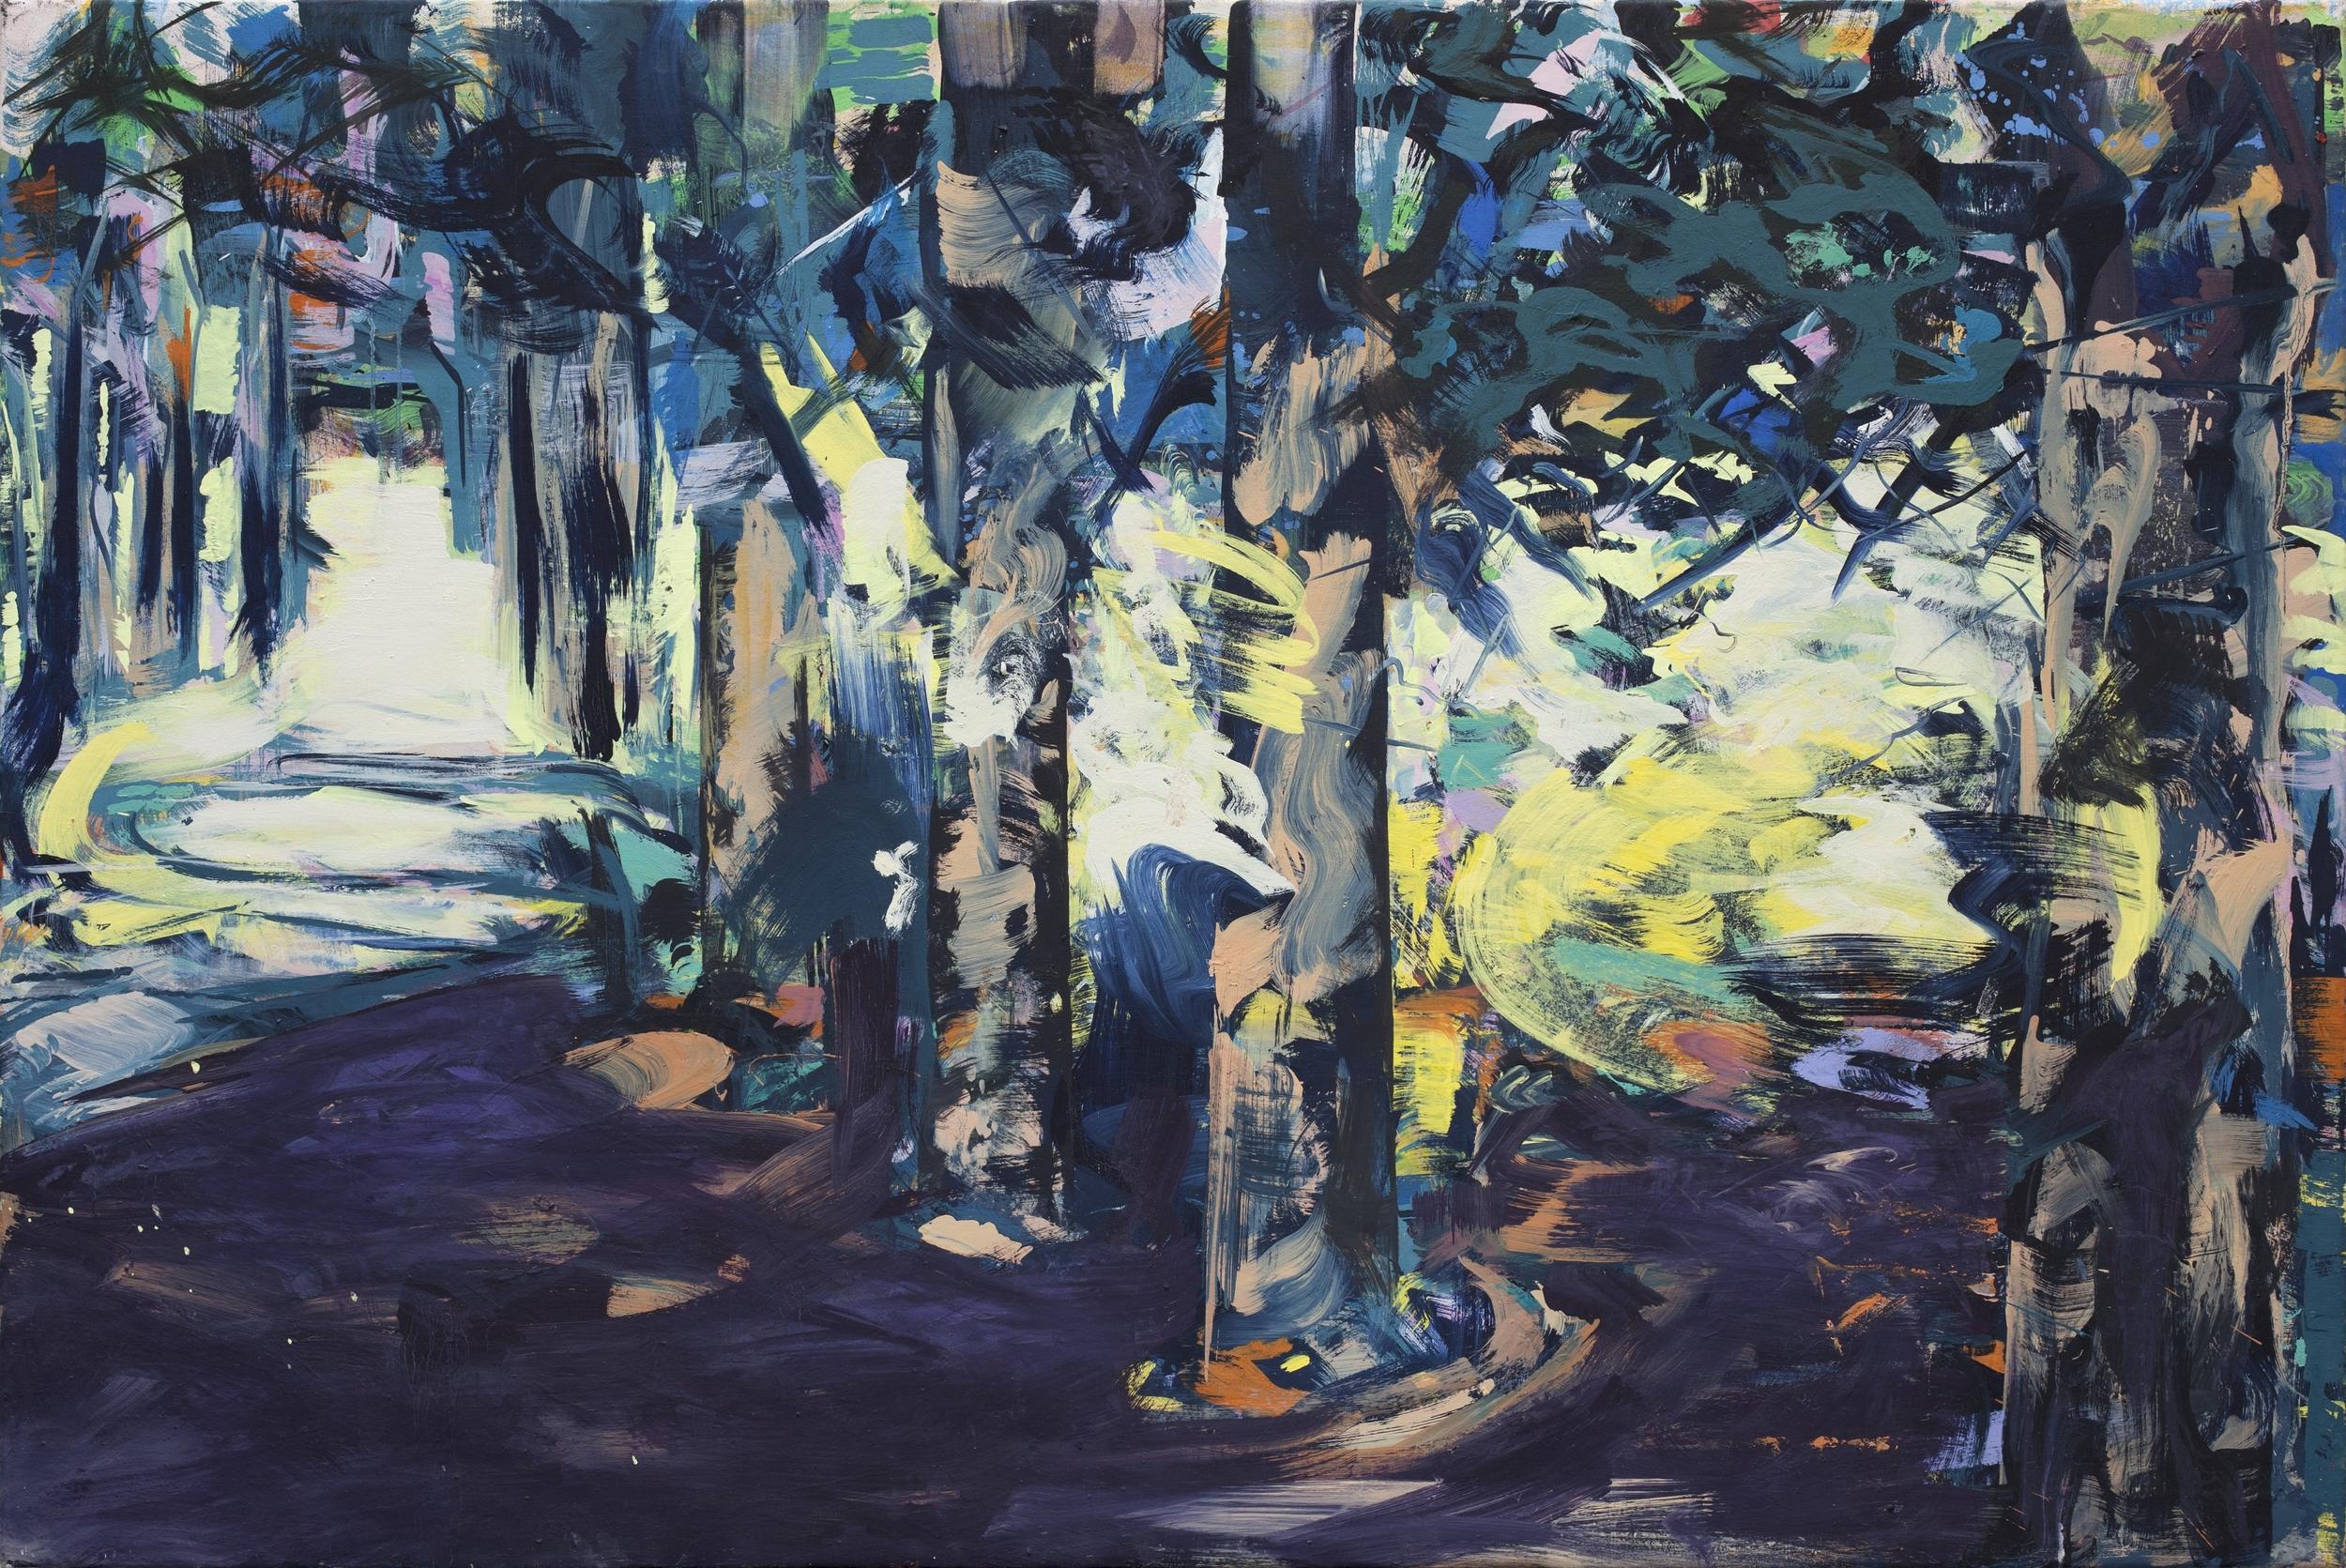 Verborgen, oil on canvas, 122 x 180 cm